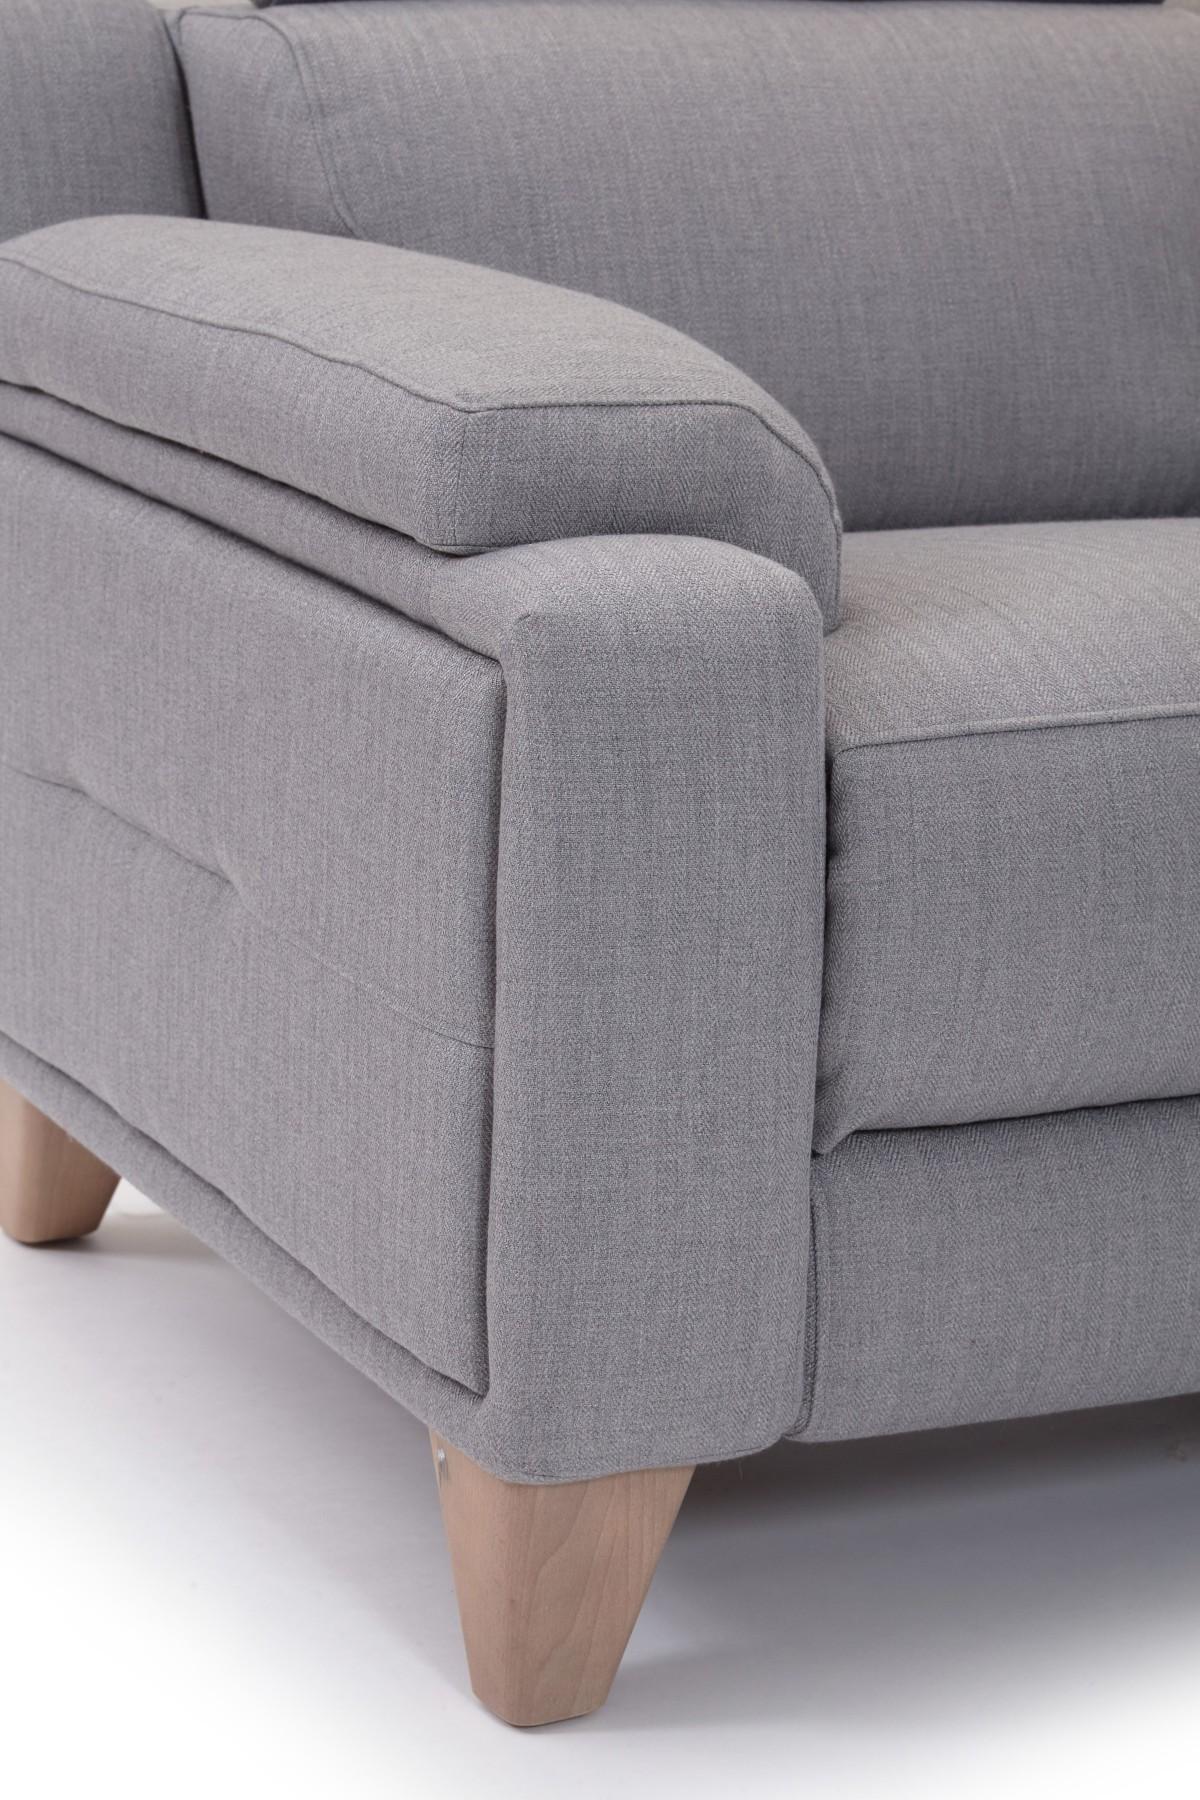 Parker Knoll Design 1701 Armchair